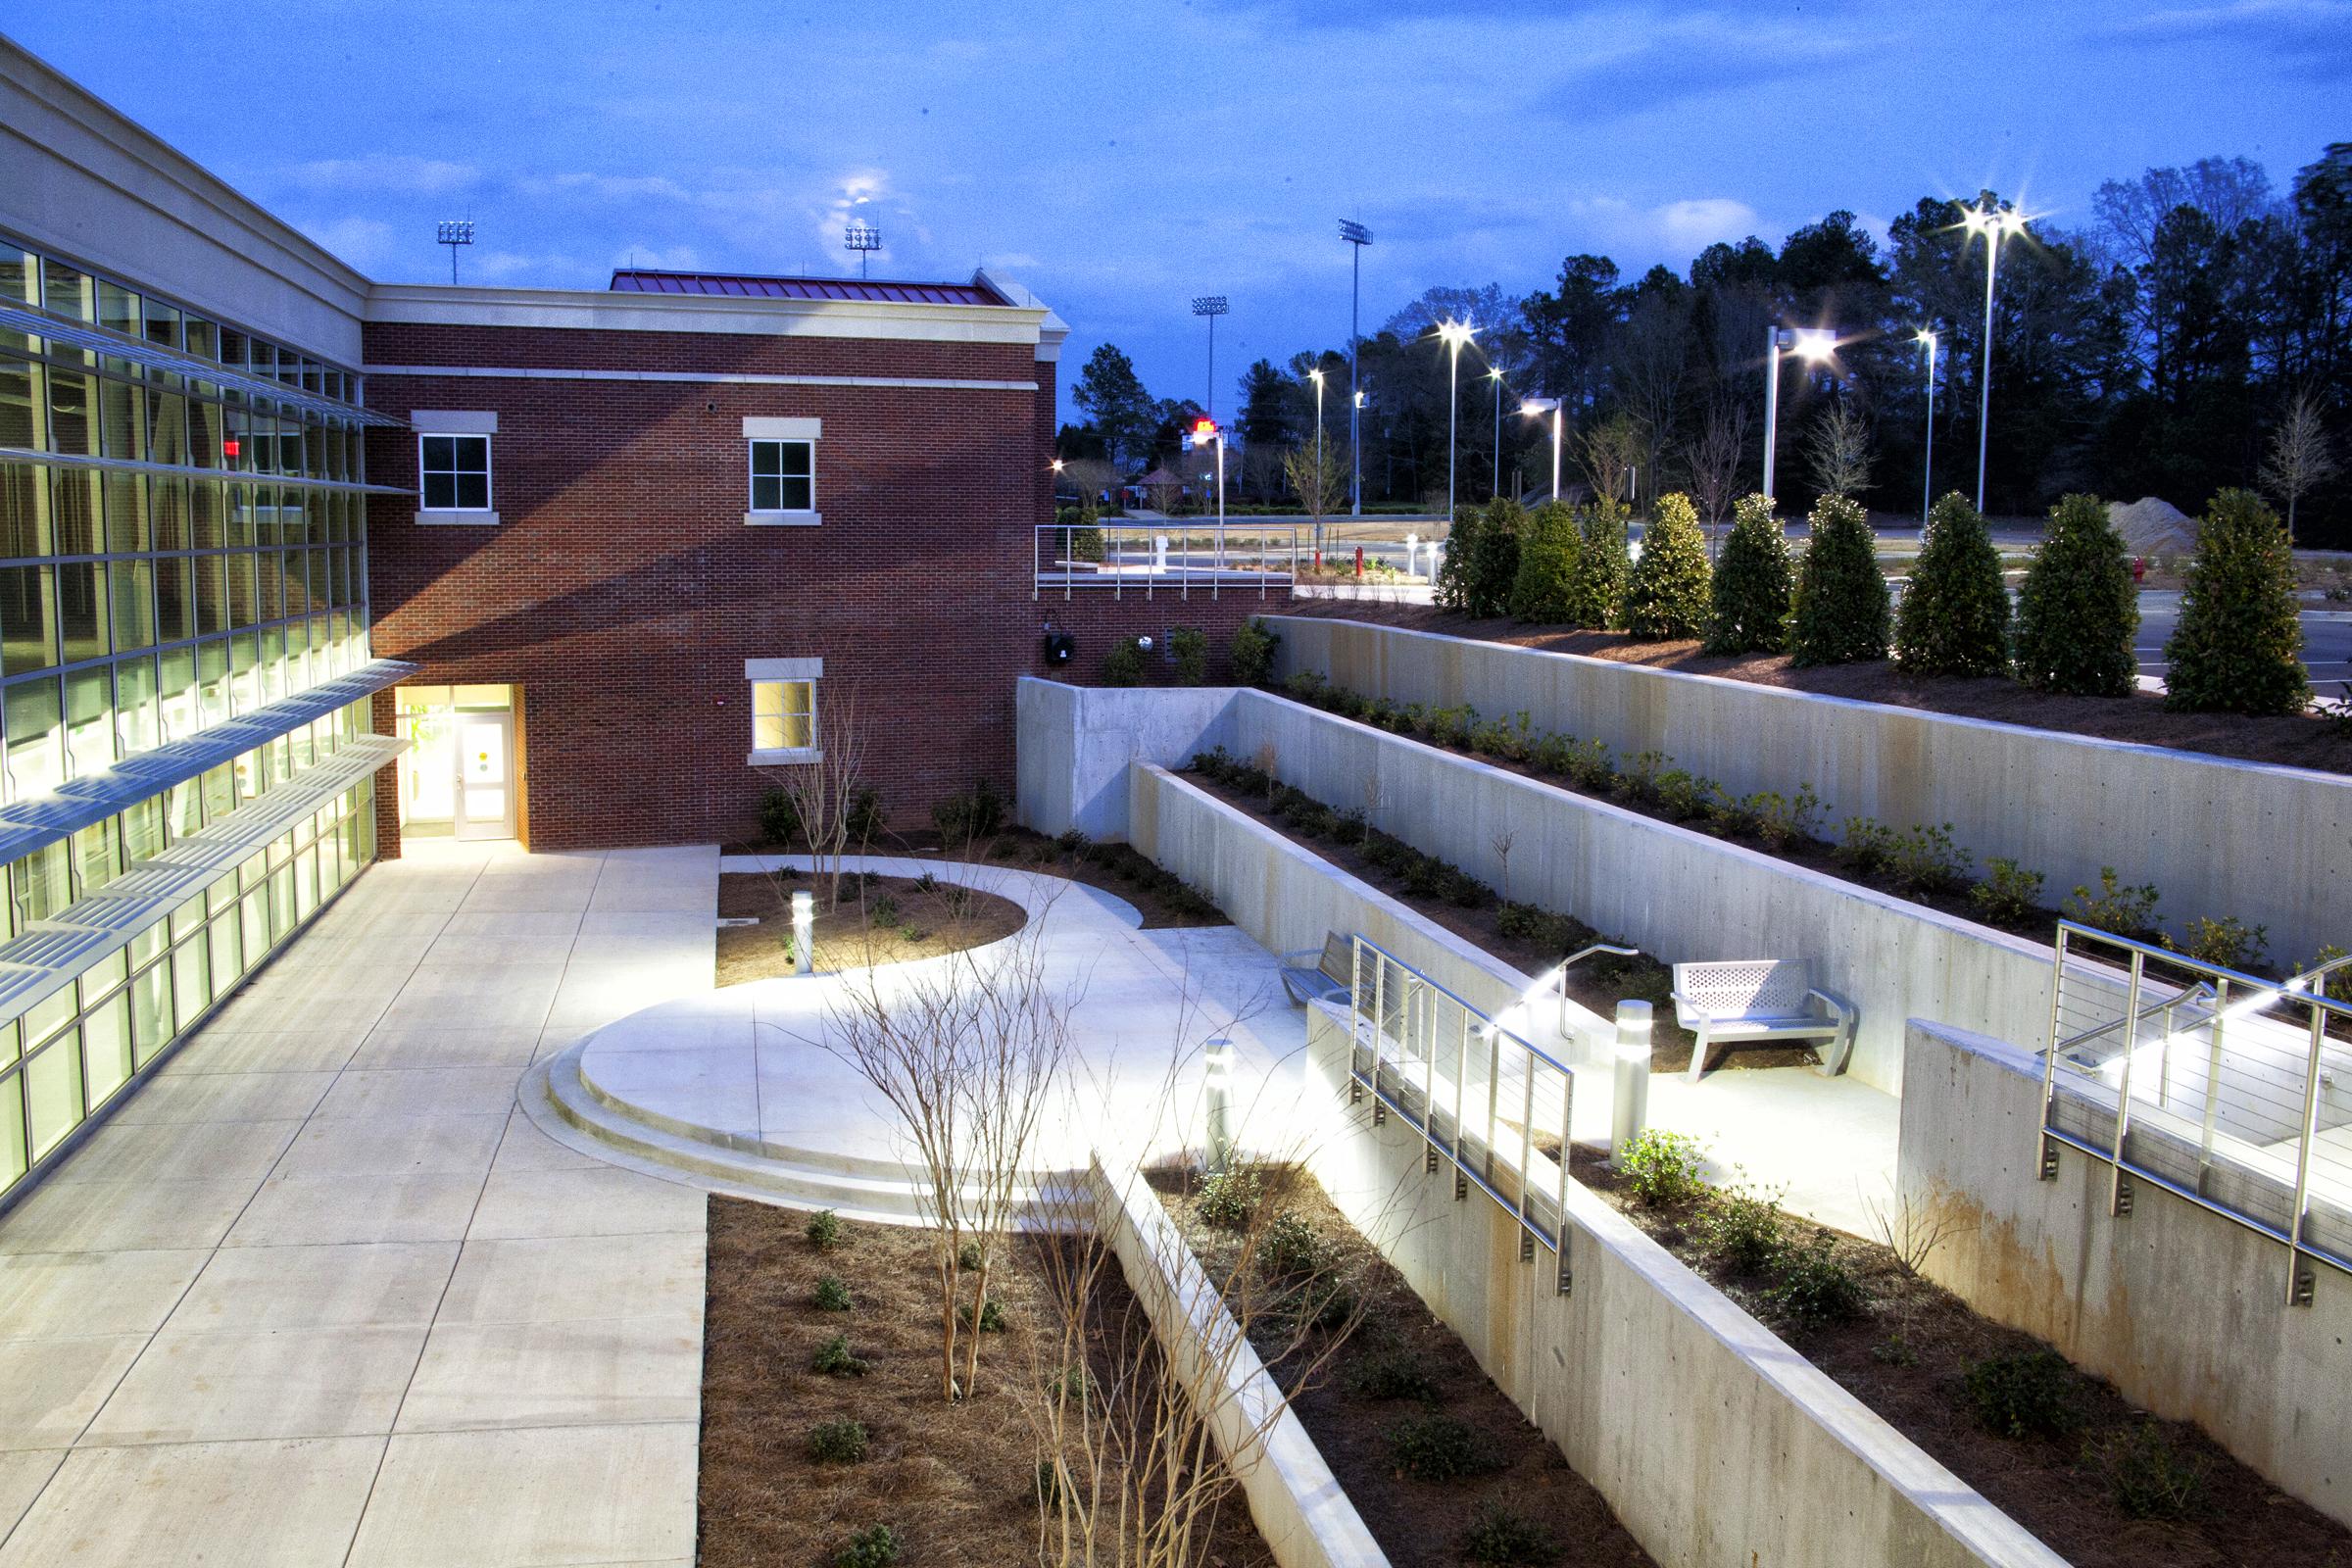 west courtyard night 1.jpg